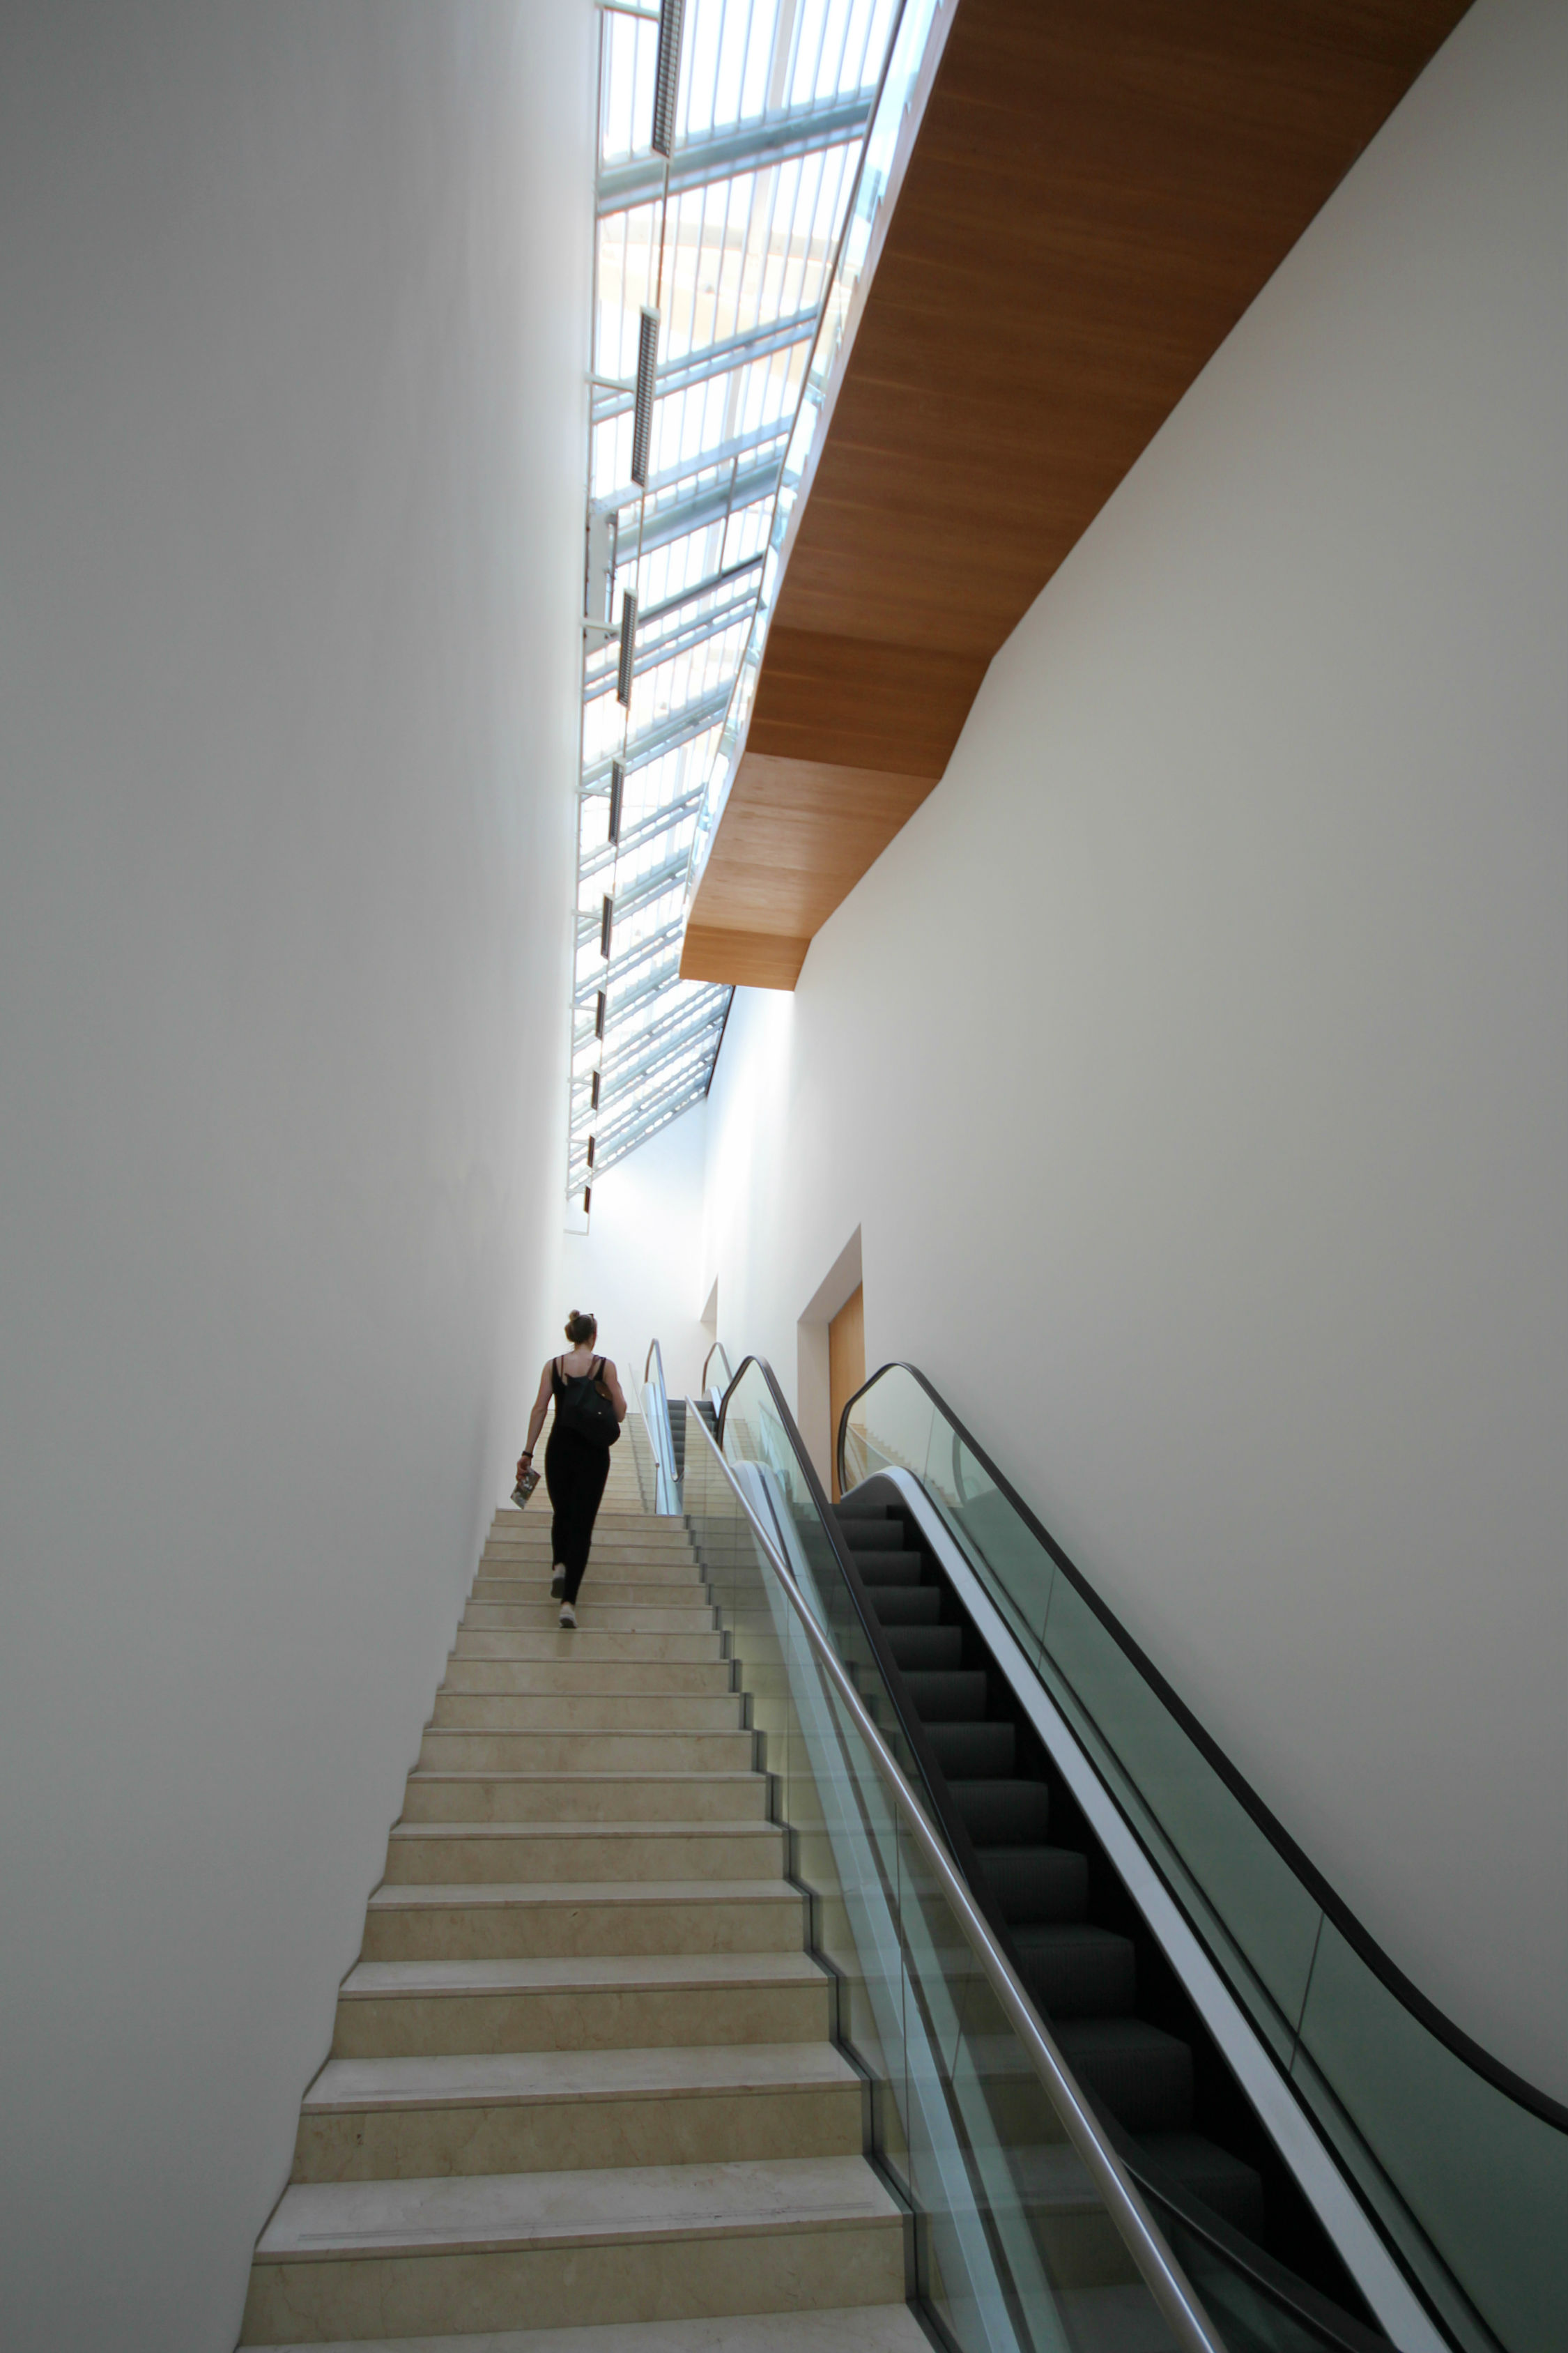 Here we visited the Collecion de Art Amalia Lacroze De Fortabat. It's hangar-like basement housed works by Turner, Breughel and Xul Solar.